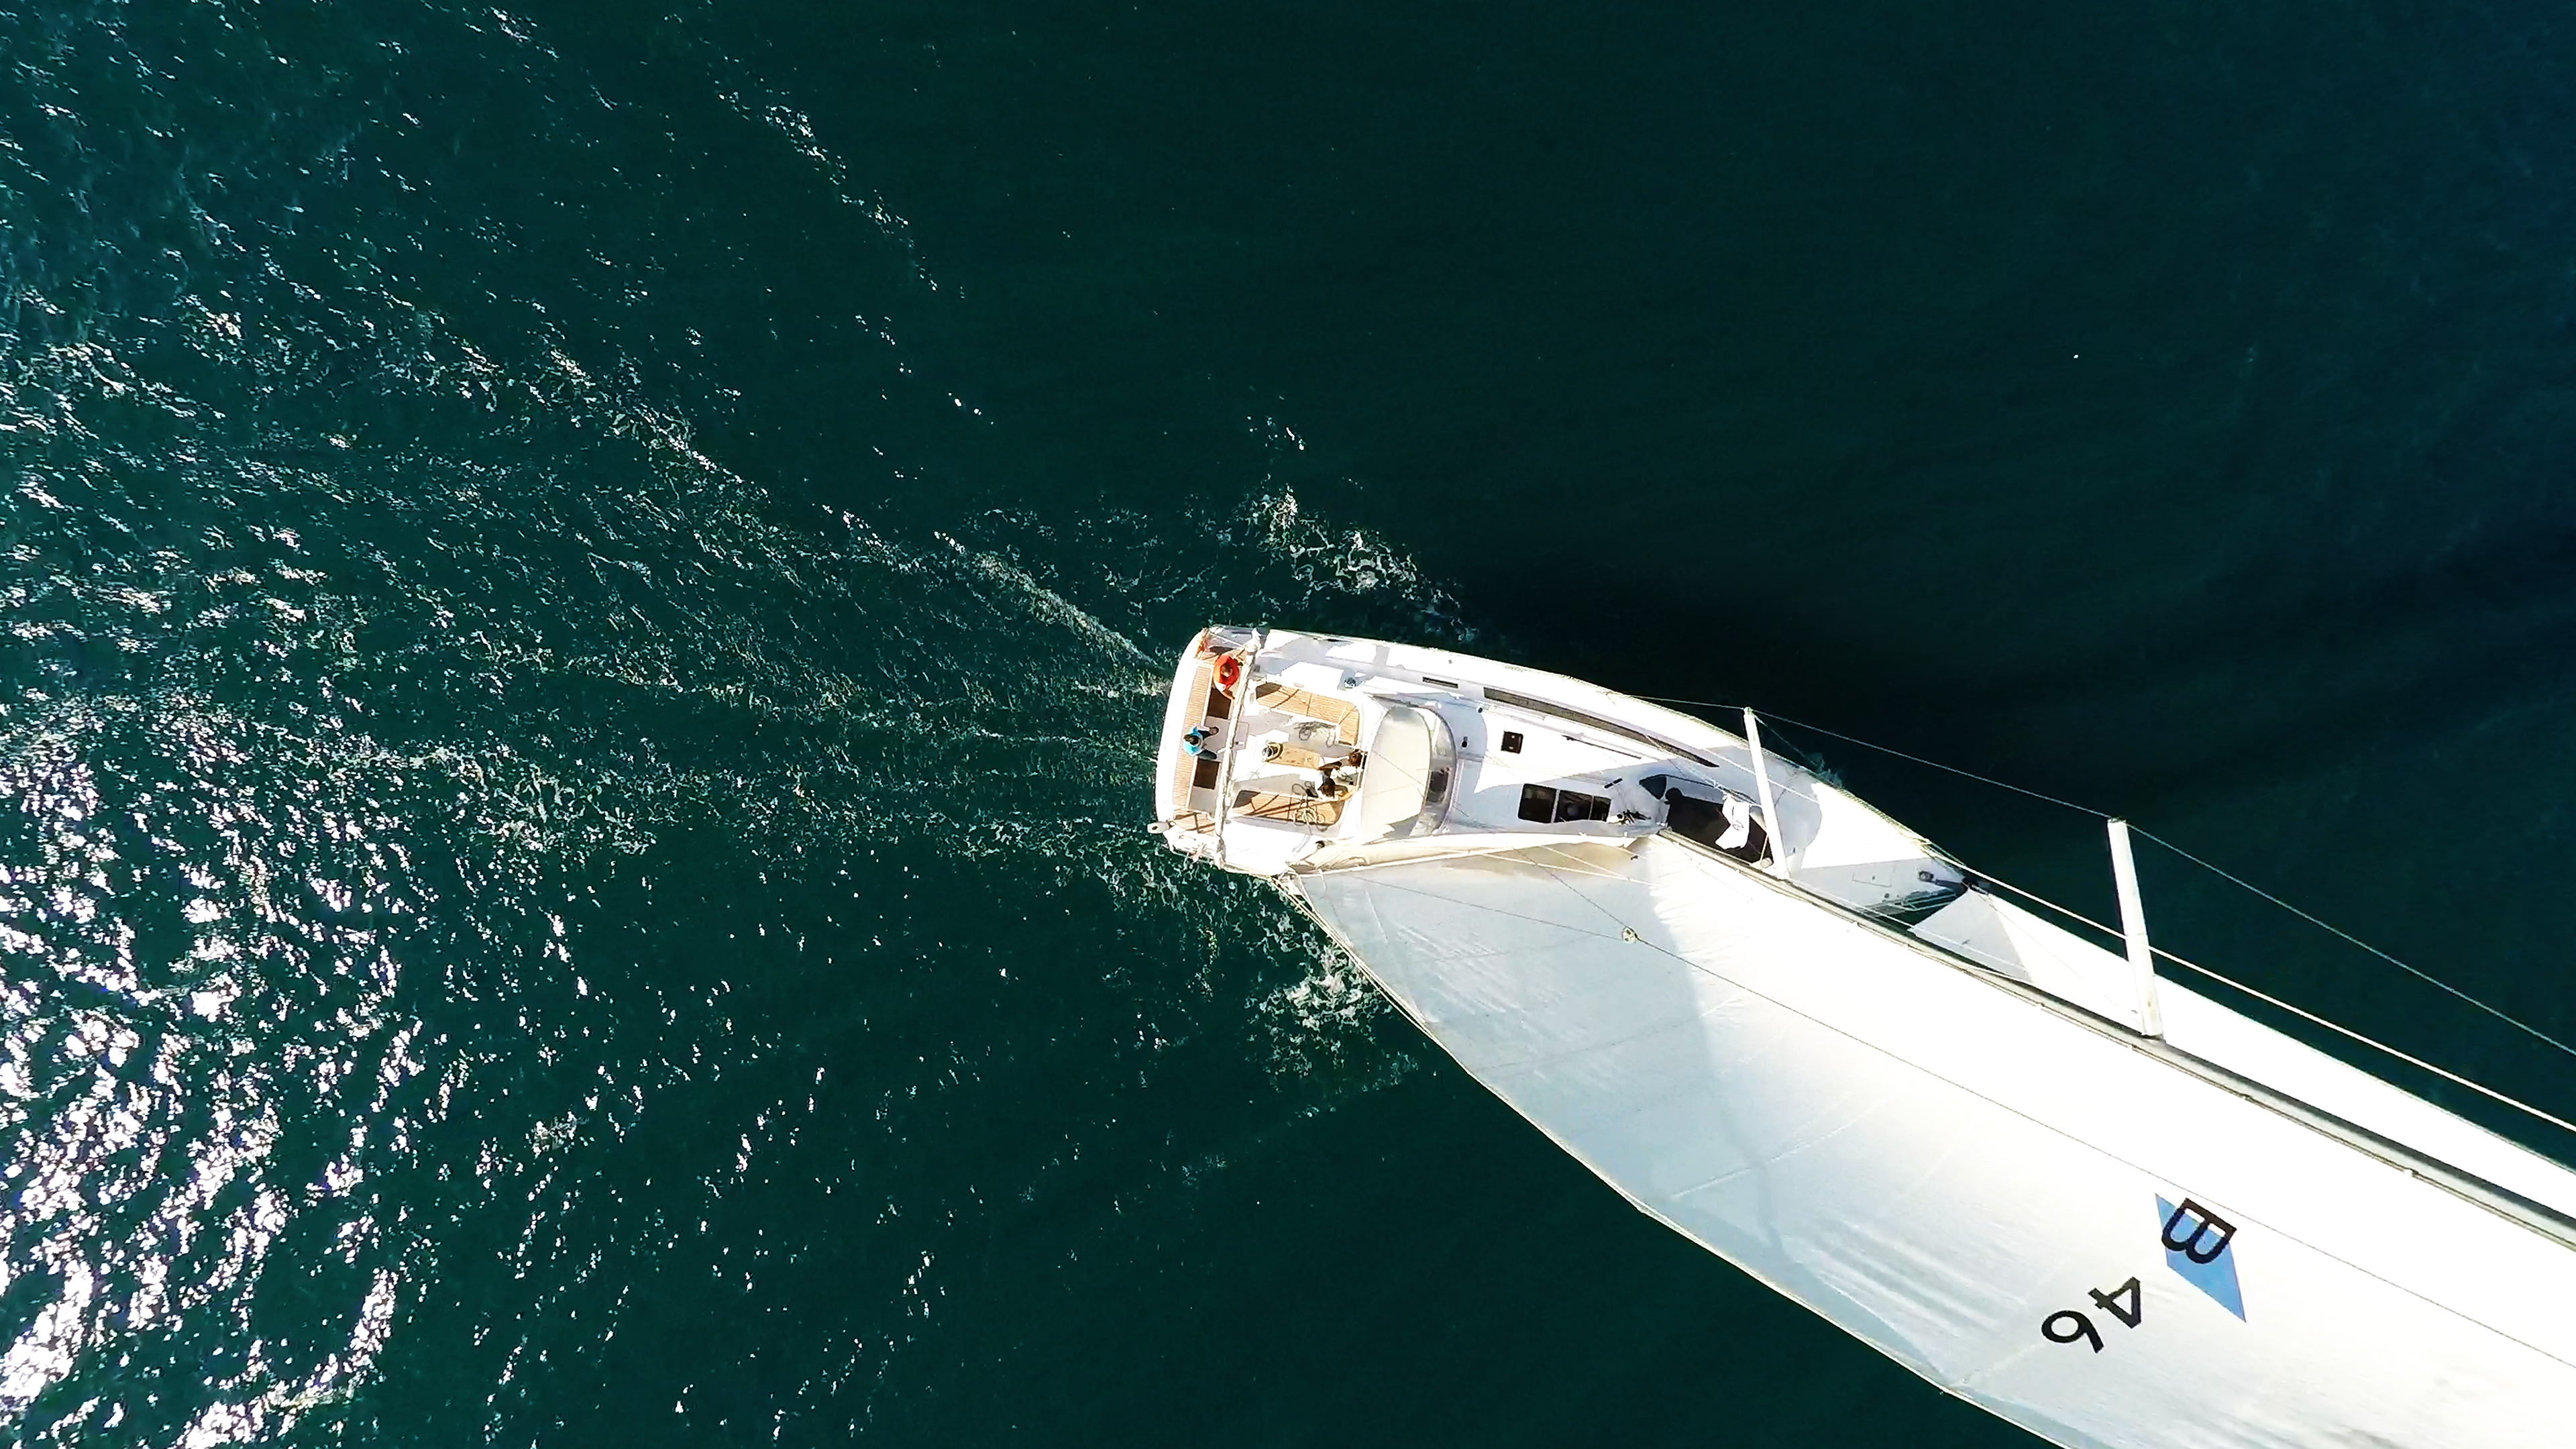 barcha a vela bavaria 46 yacht a vela randa nadir vista verticalee pozzetto